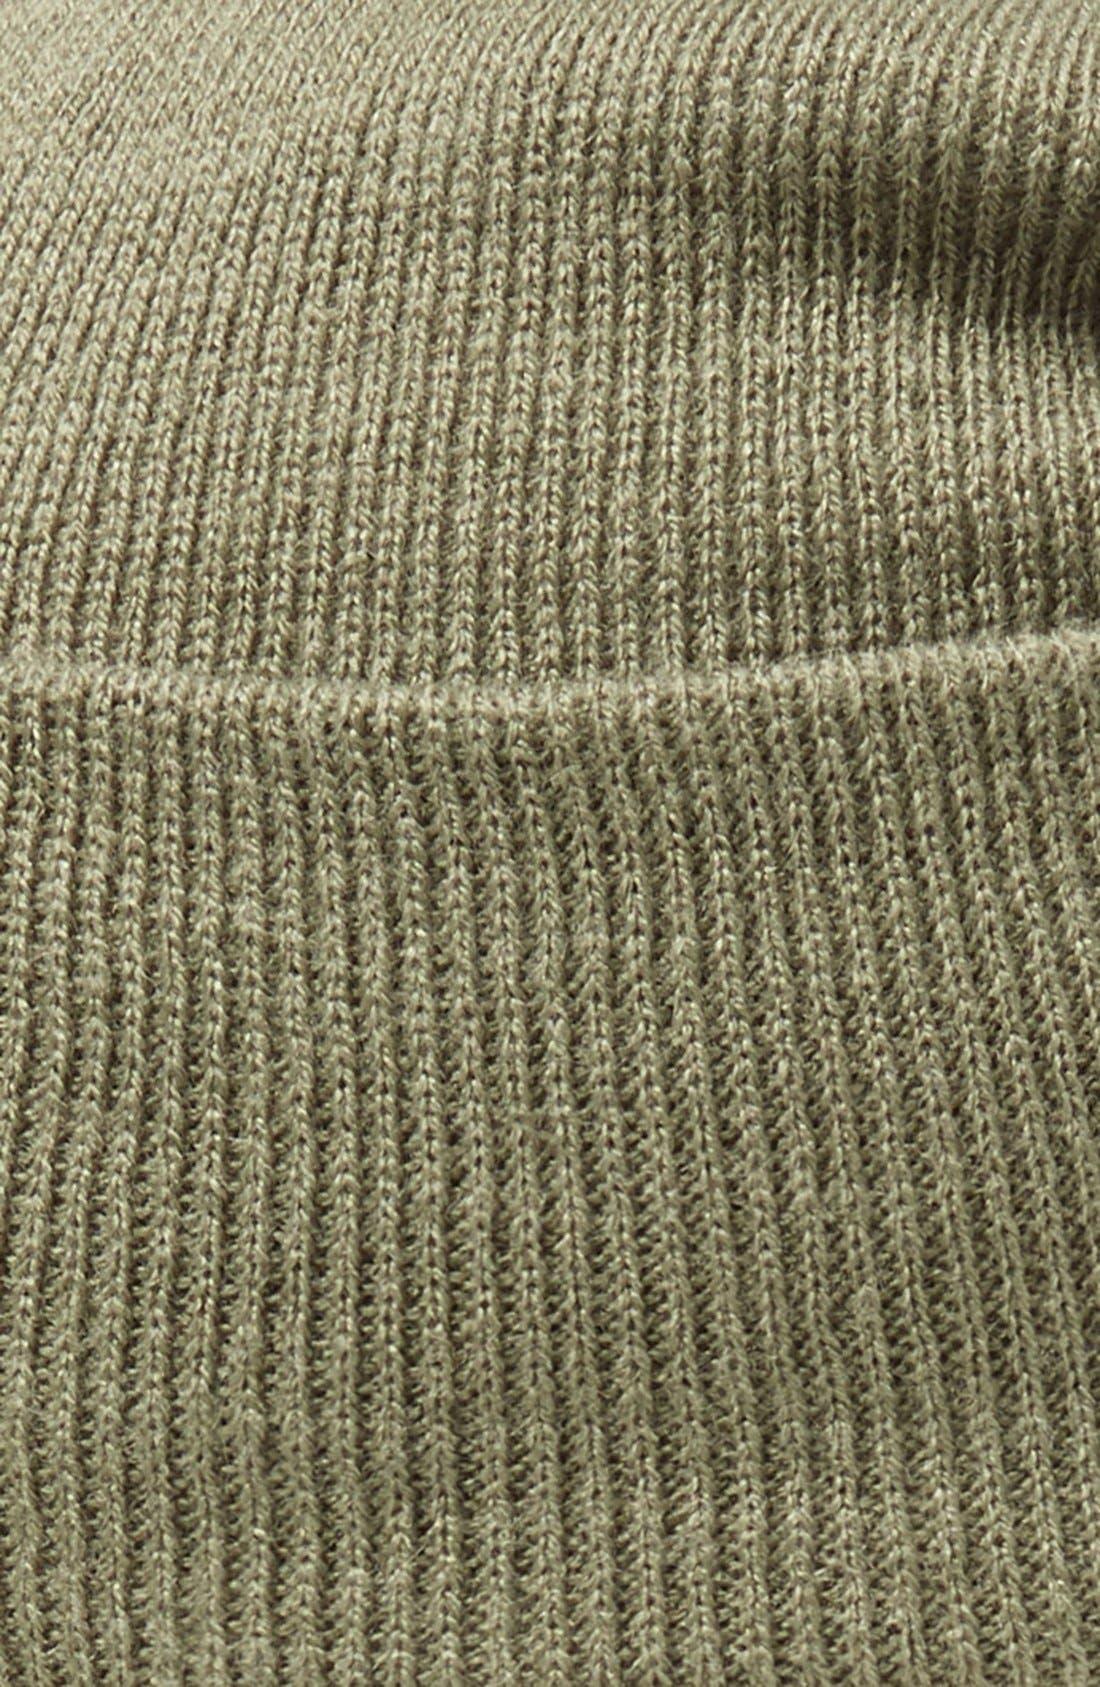 'Abbott' Knit Cap,                             Alternate thumbnail 13, color,